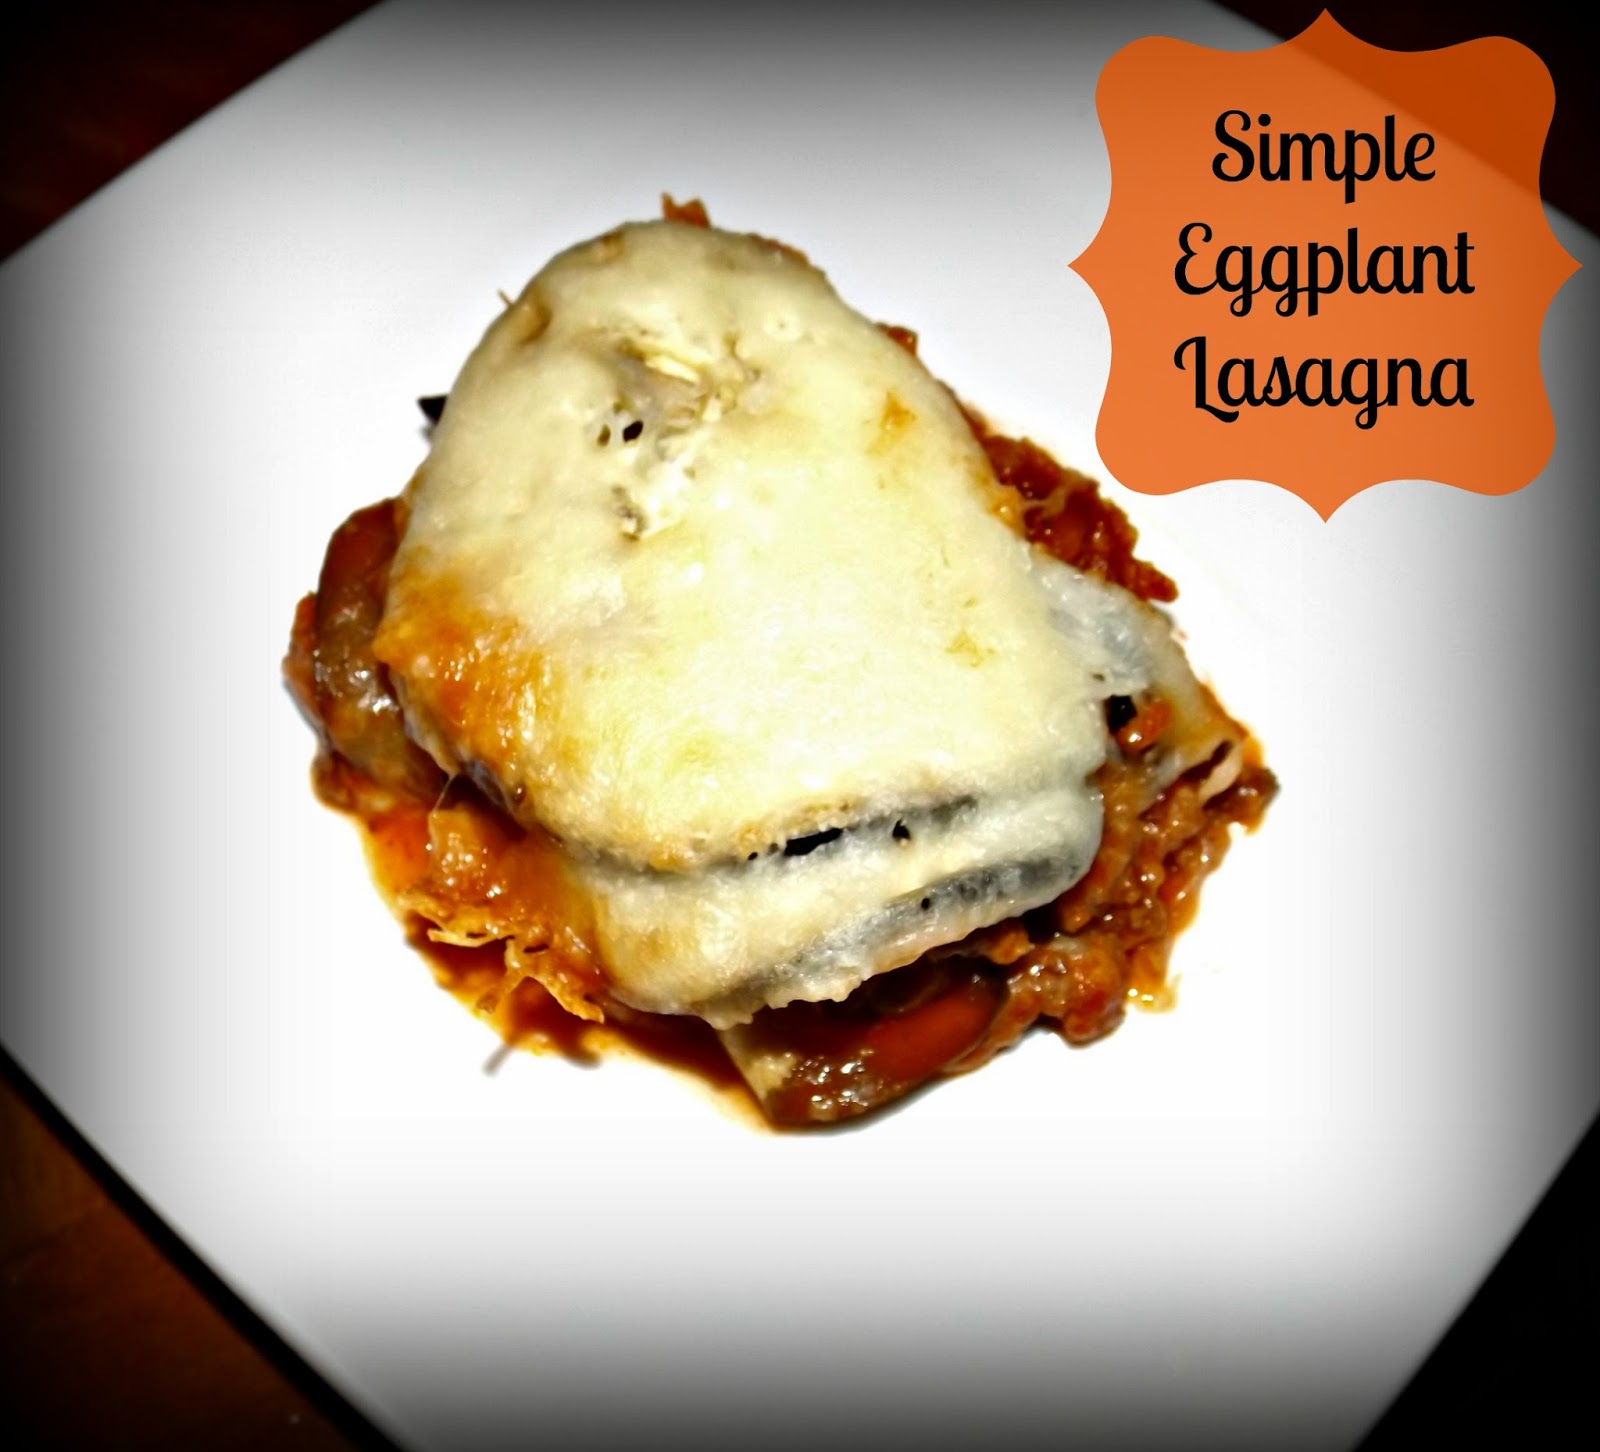 Simple Eggplant Lasagna